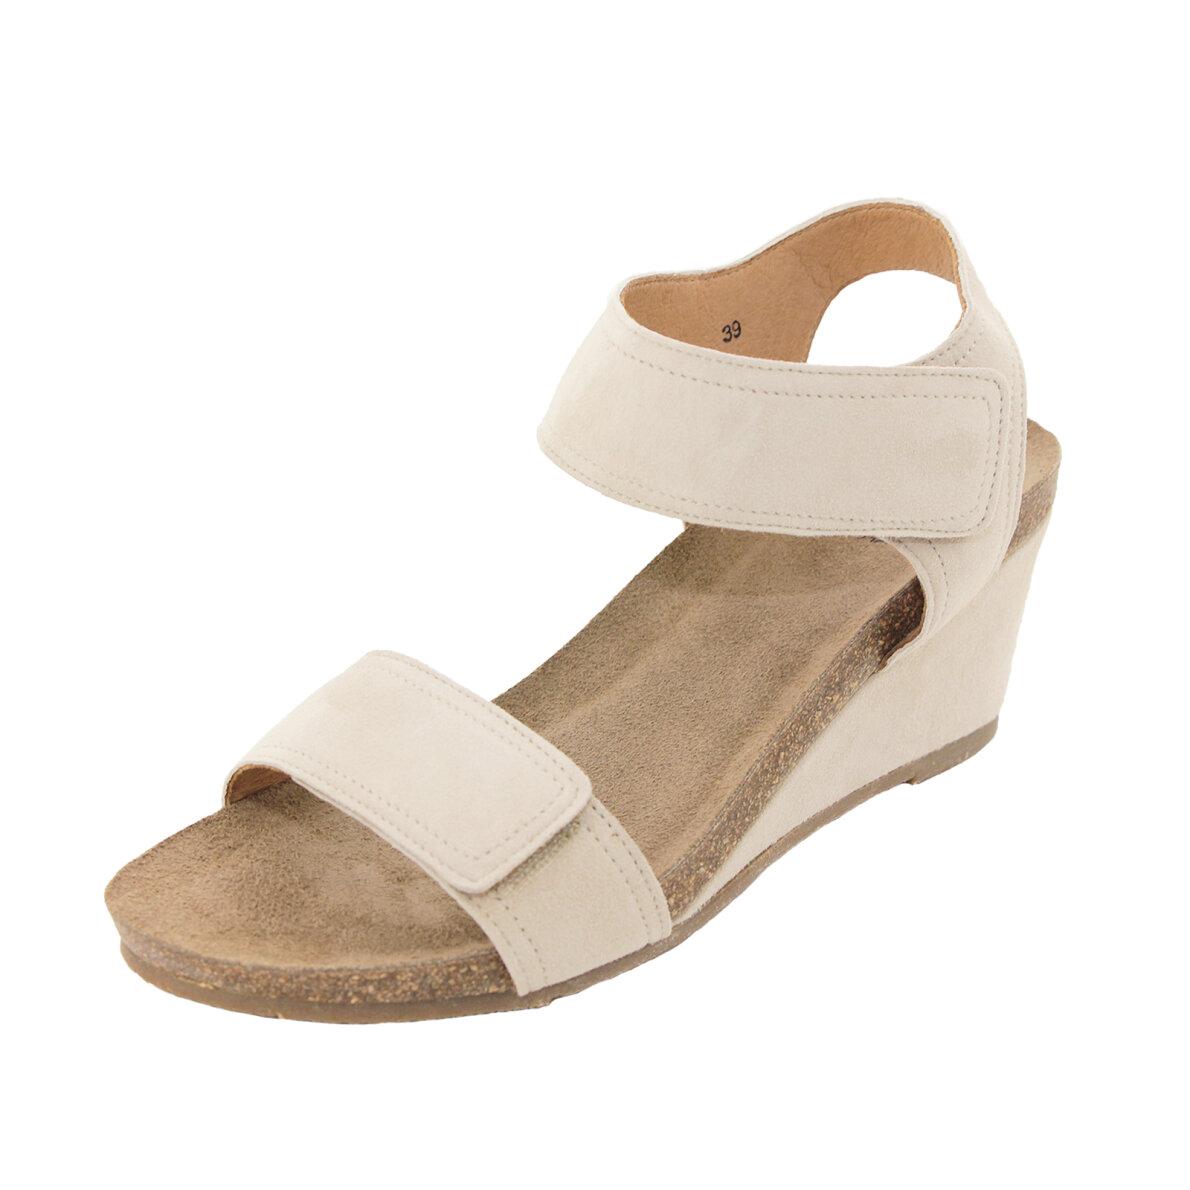 24ff5e06 ... Cashott - Cashott 13011 Beige Sandal med Kilehæl